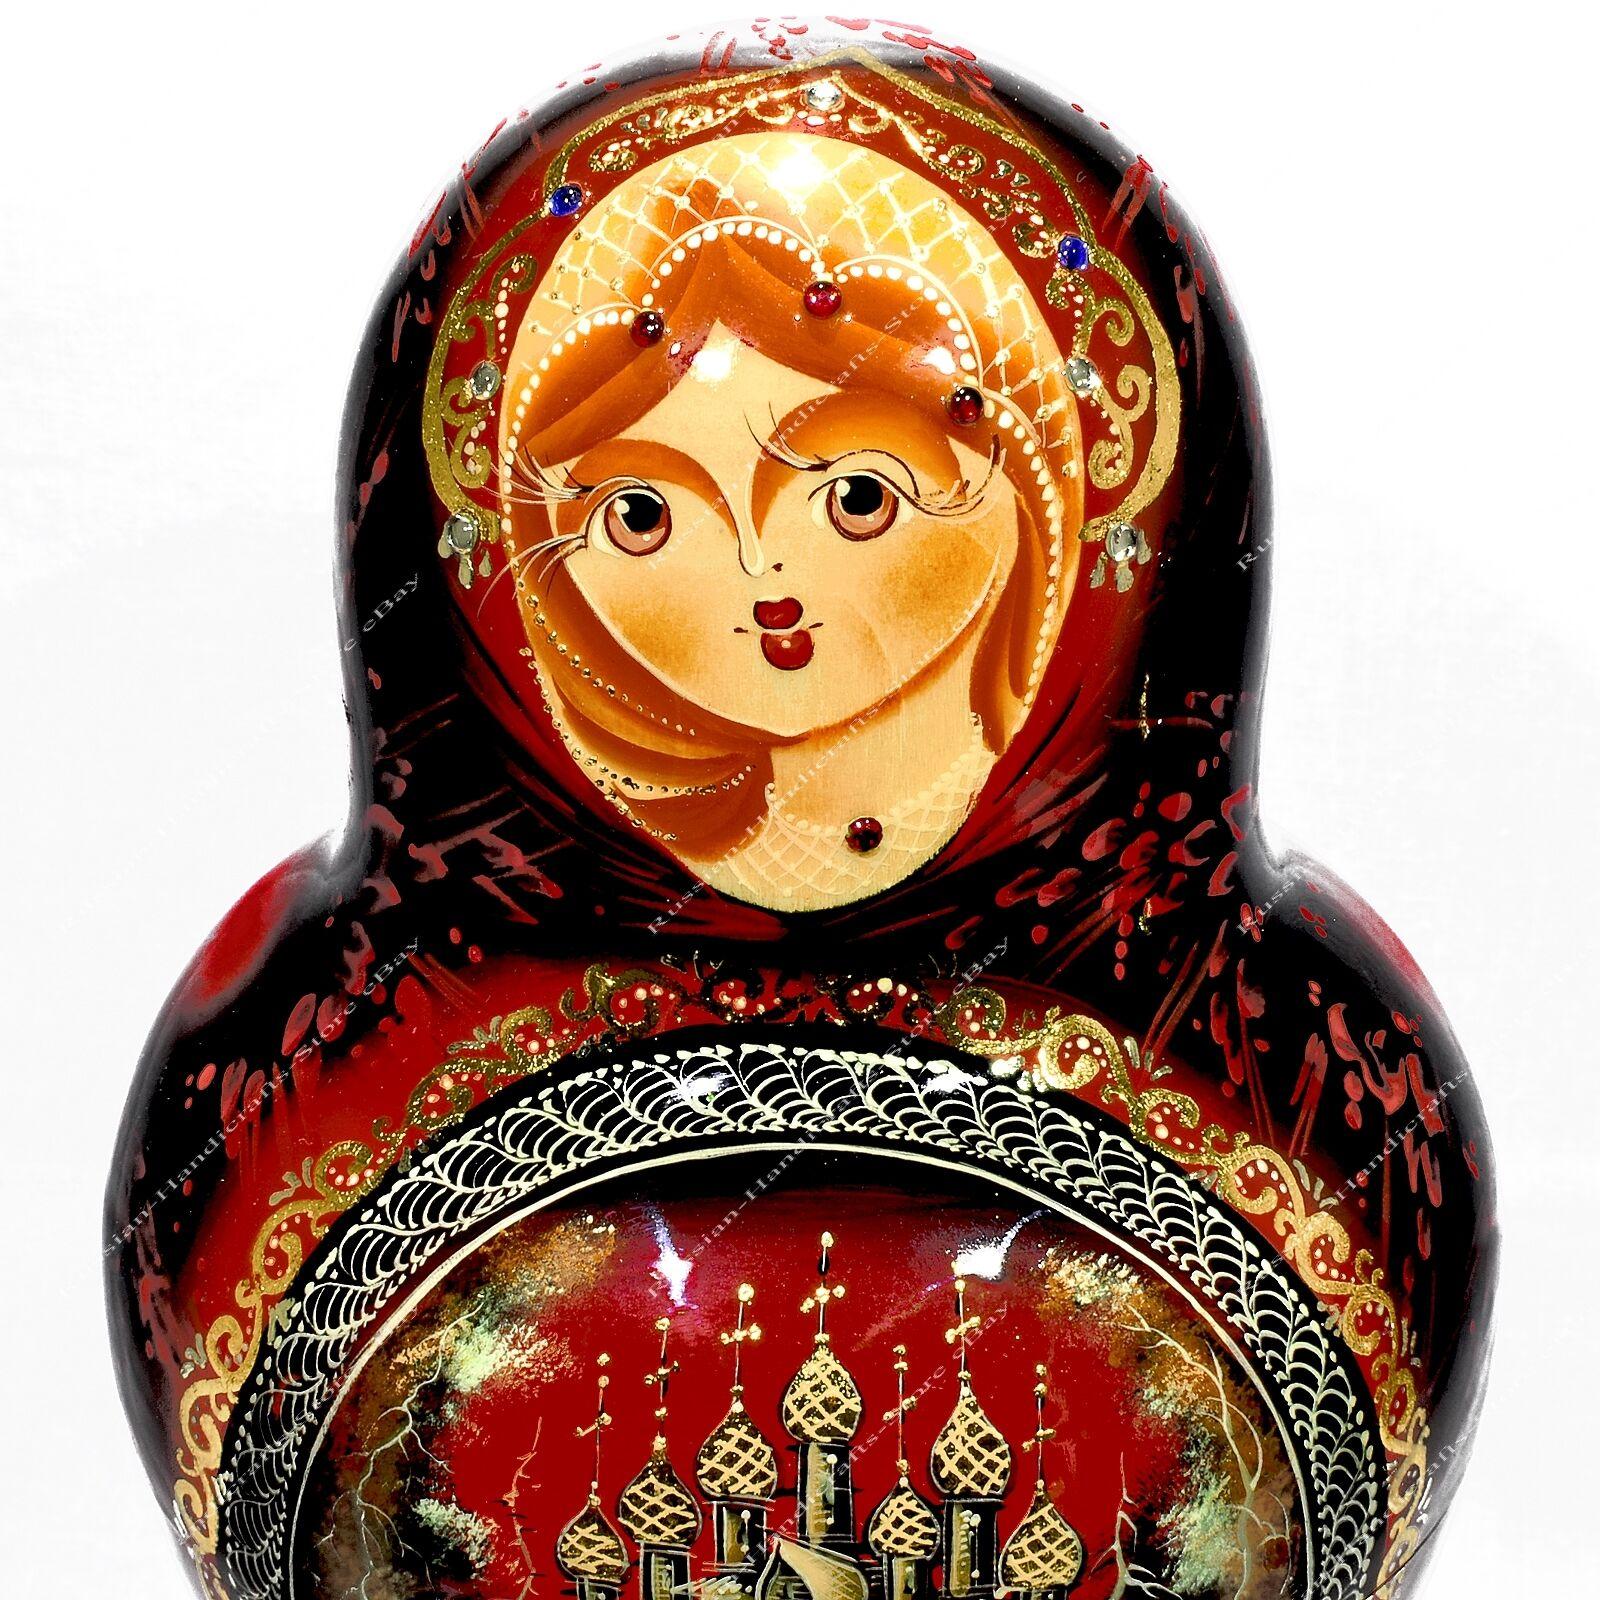 GORGEOUS  AUTHOR'S RUSSIAN TRADITIONAL MATRYOSHKA NESTING bambolaS CHURCHES 10PCS  risparmia fino al 70%